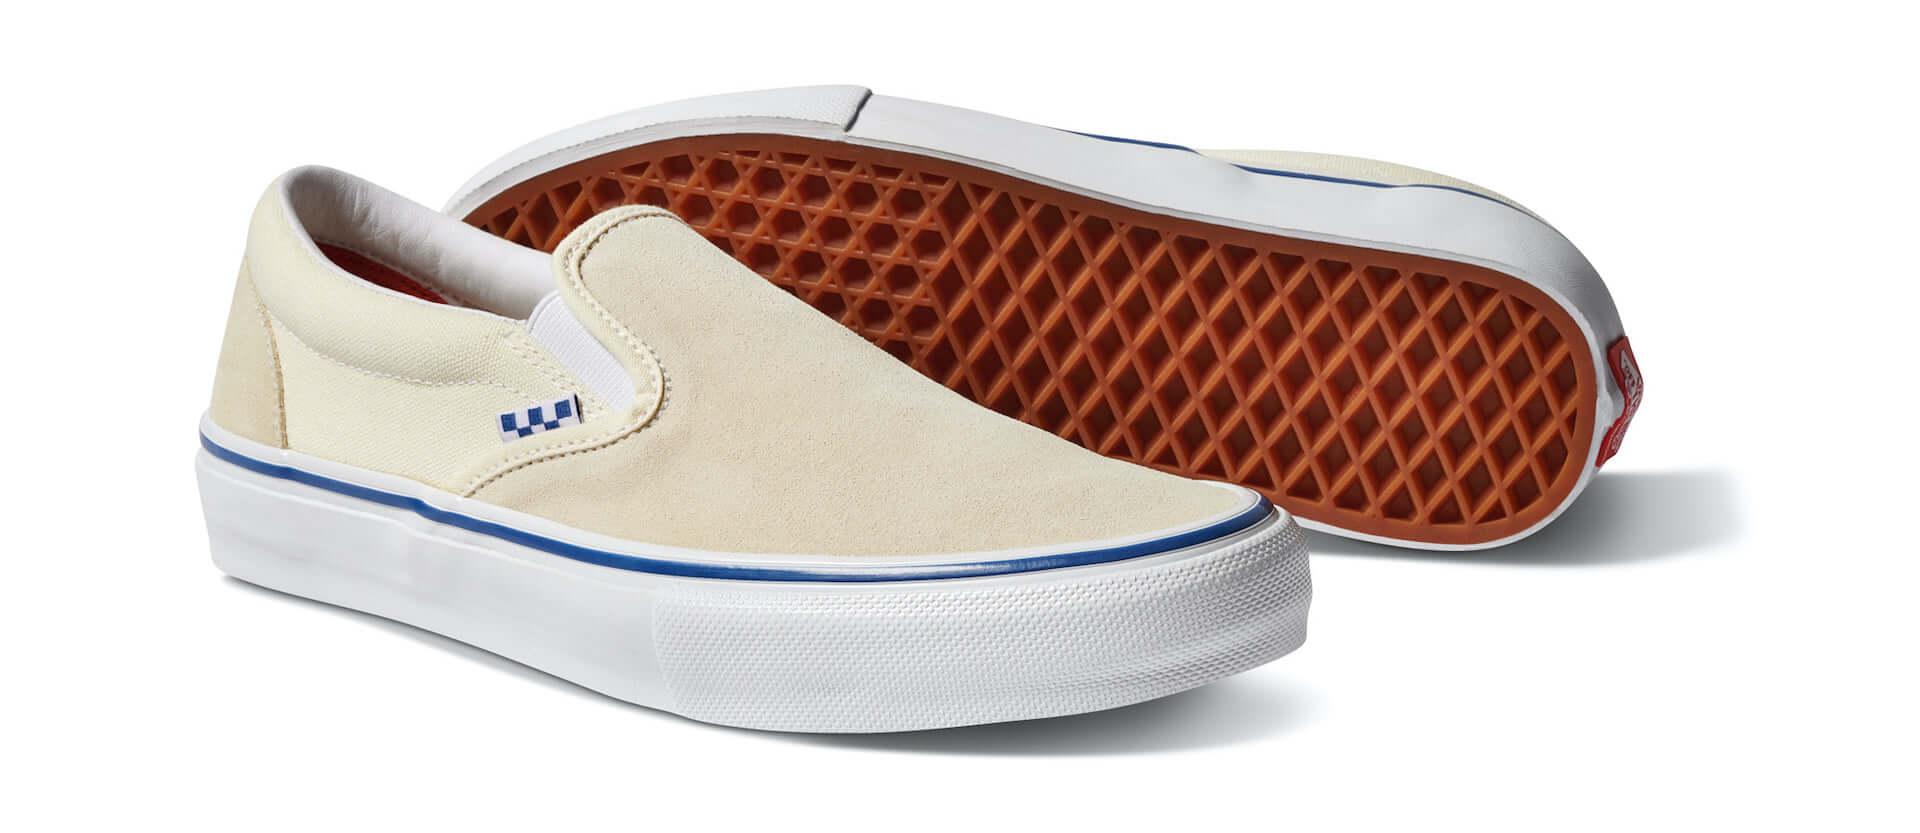 "VANSがスケーターに向けた新コレクション「Skate Classics」を発表!""全てが新しくなった""素材・構造に注目 lf210304_vans_14-1920x833"